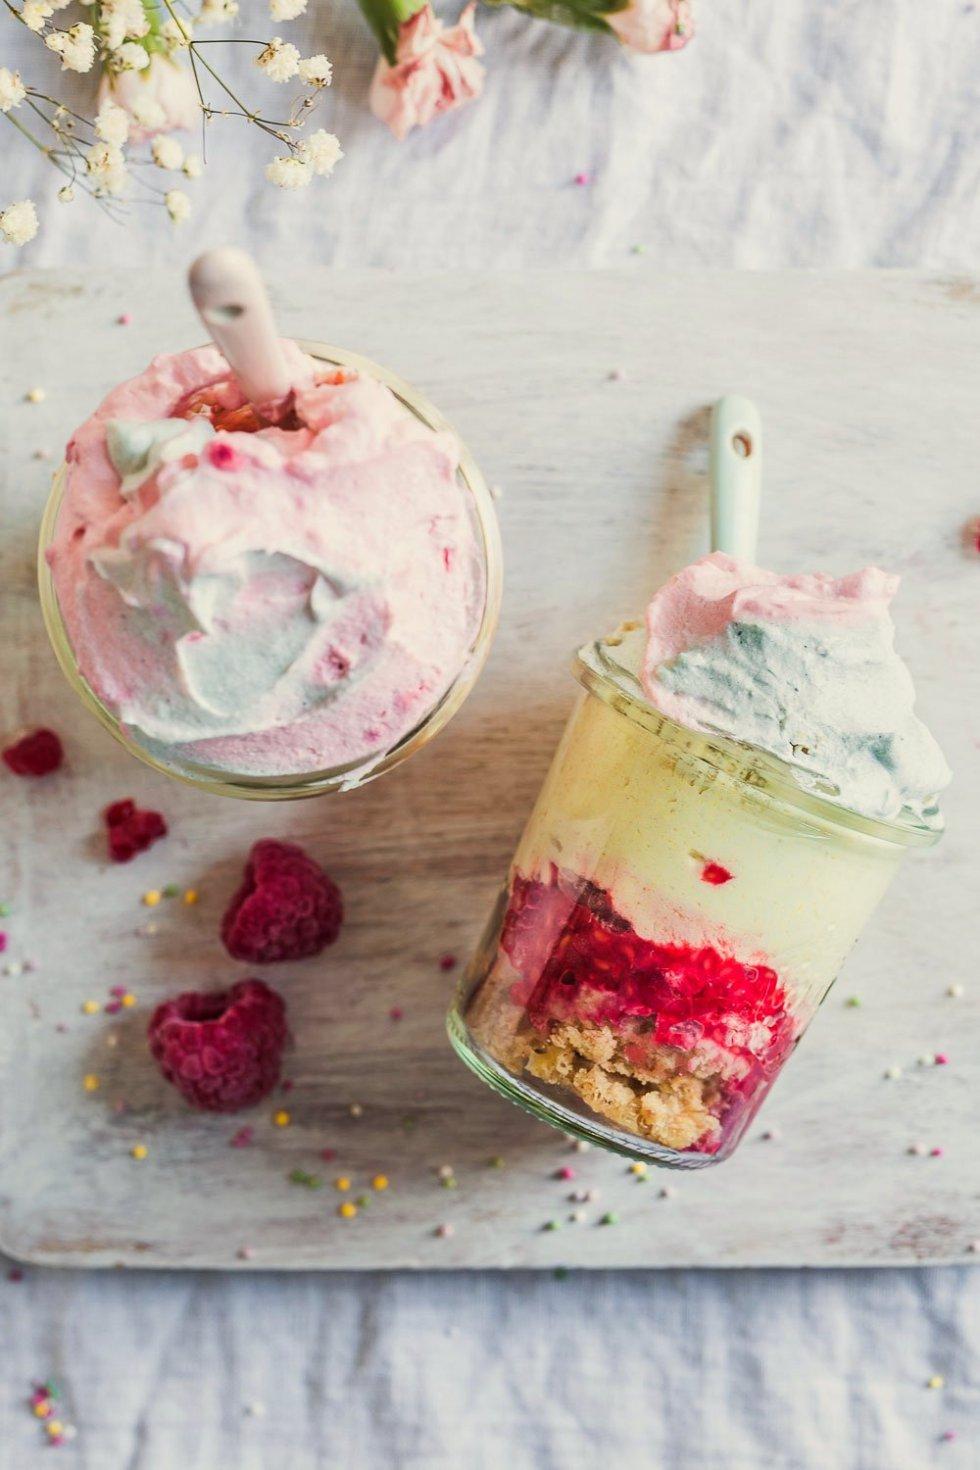 Creamy vegan cheesecakes in jar